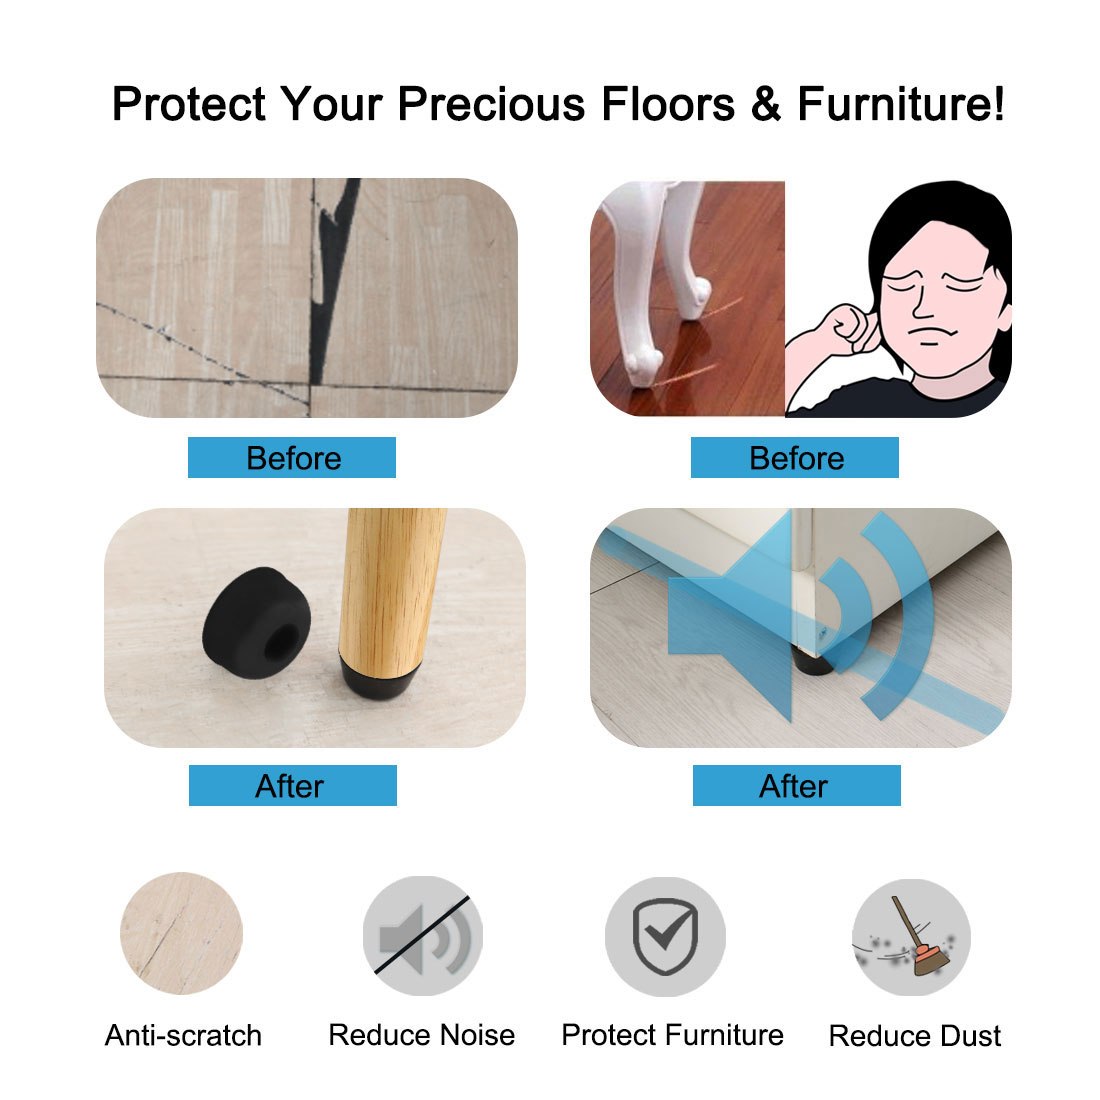 9pcs Rubber Feet Bumper Furniture Cutting Board Leg Pad Protector, D19x17xH10mm - image 4 de 7